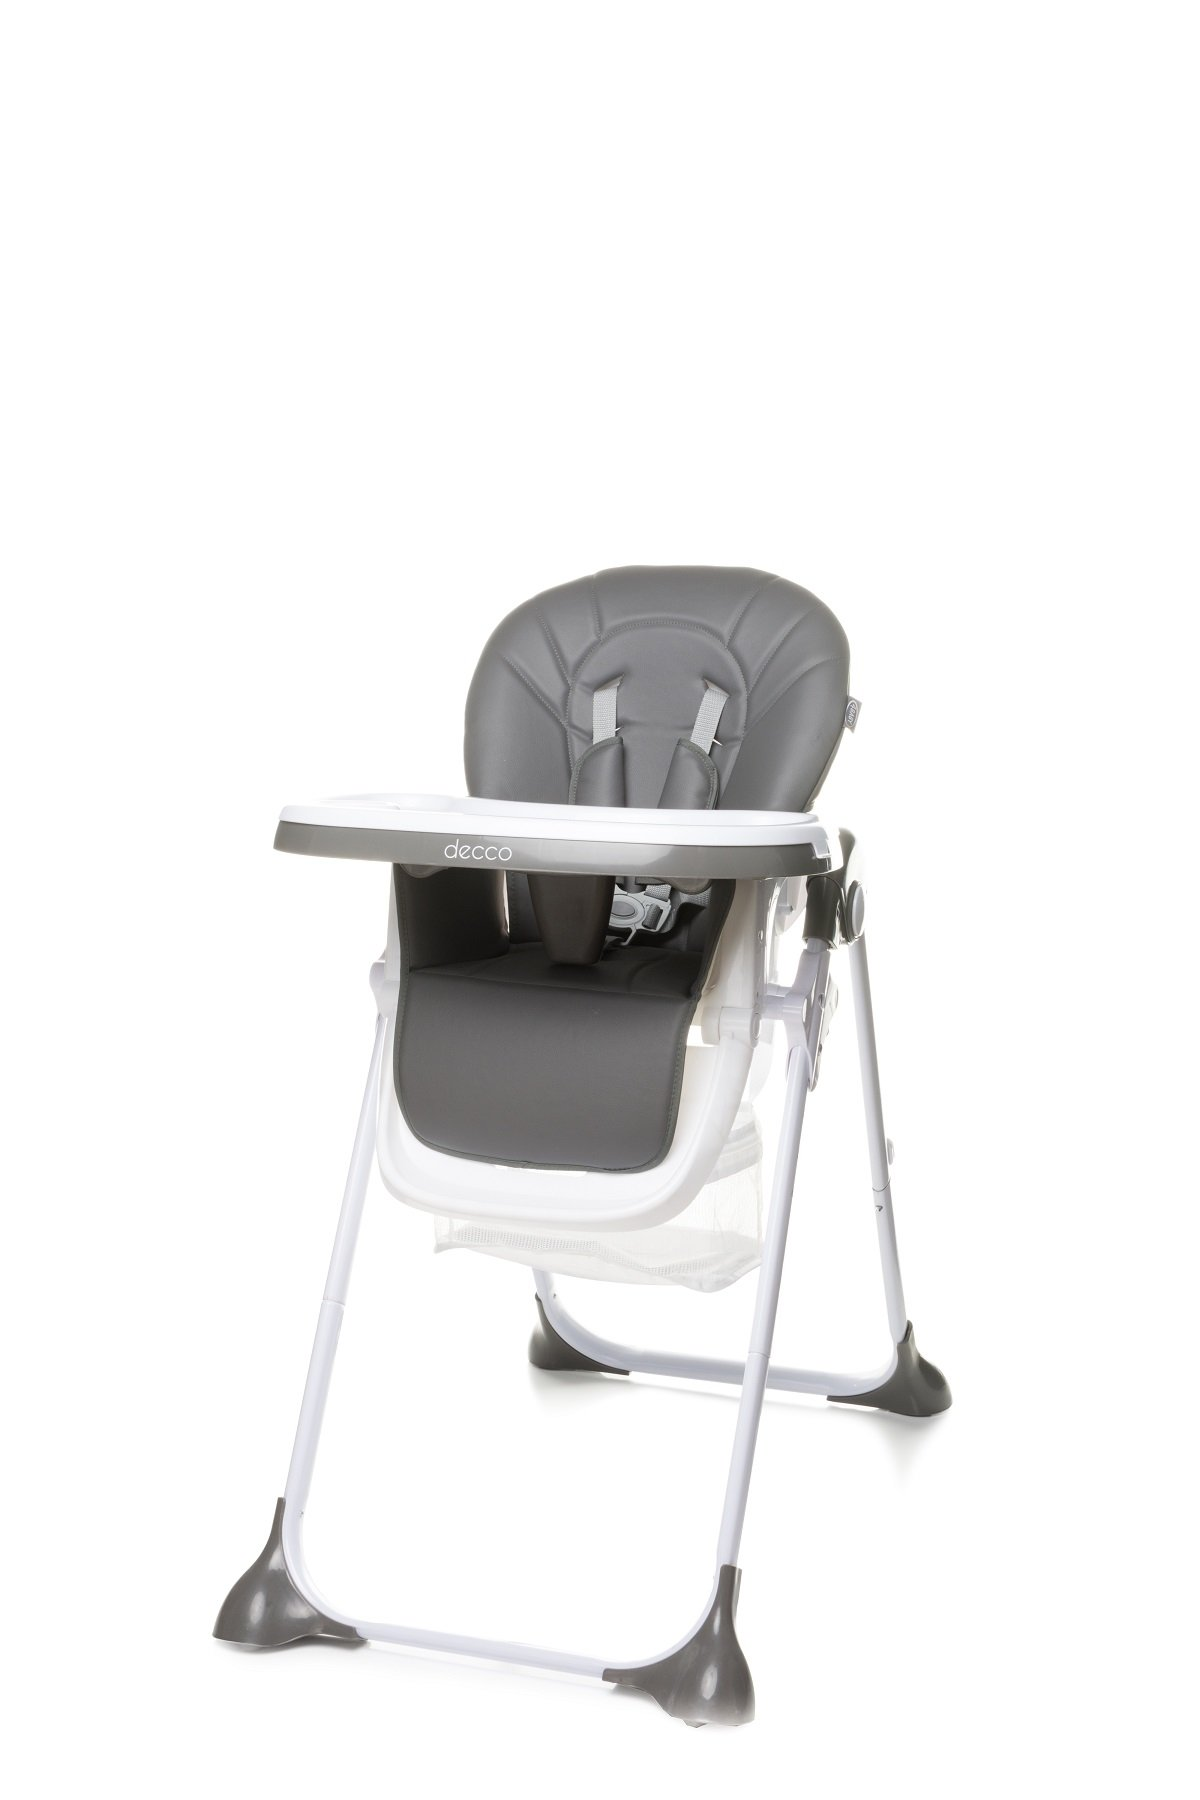 Jed�lensk� stoli�ka DECCO siv�